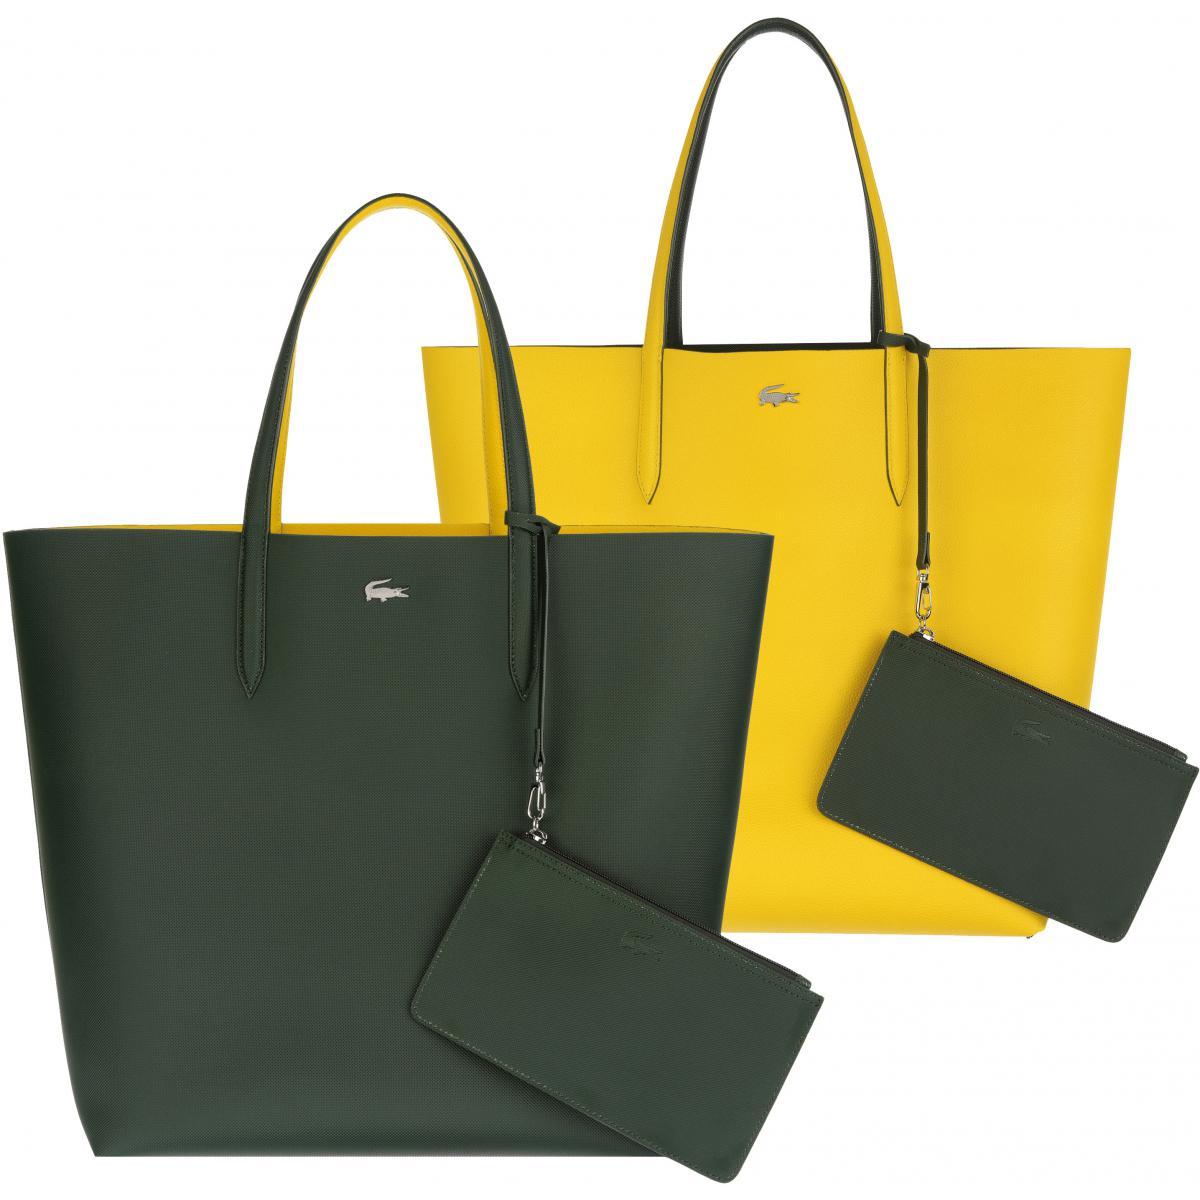 Shopping > sac lacoste jaune femme, Up to 71% OFF